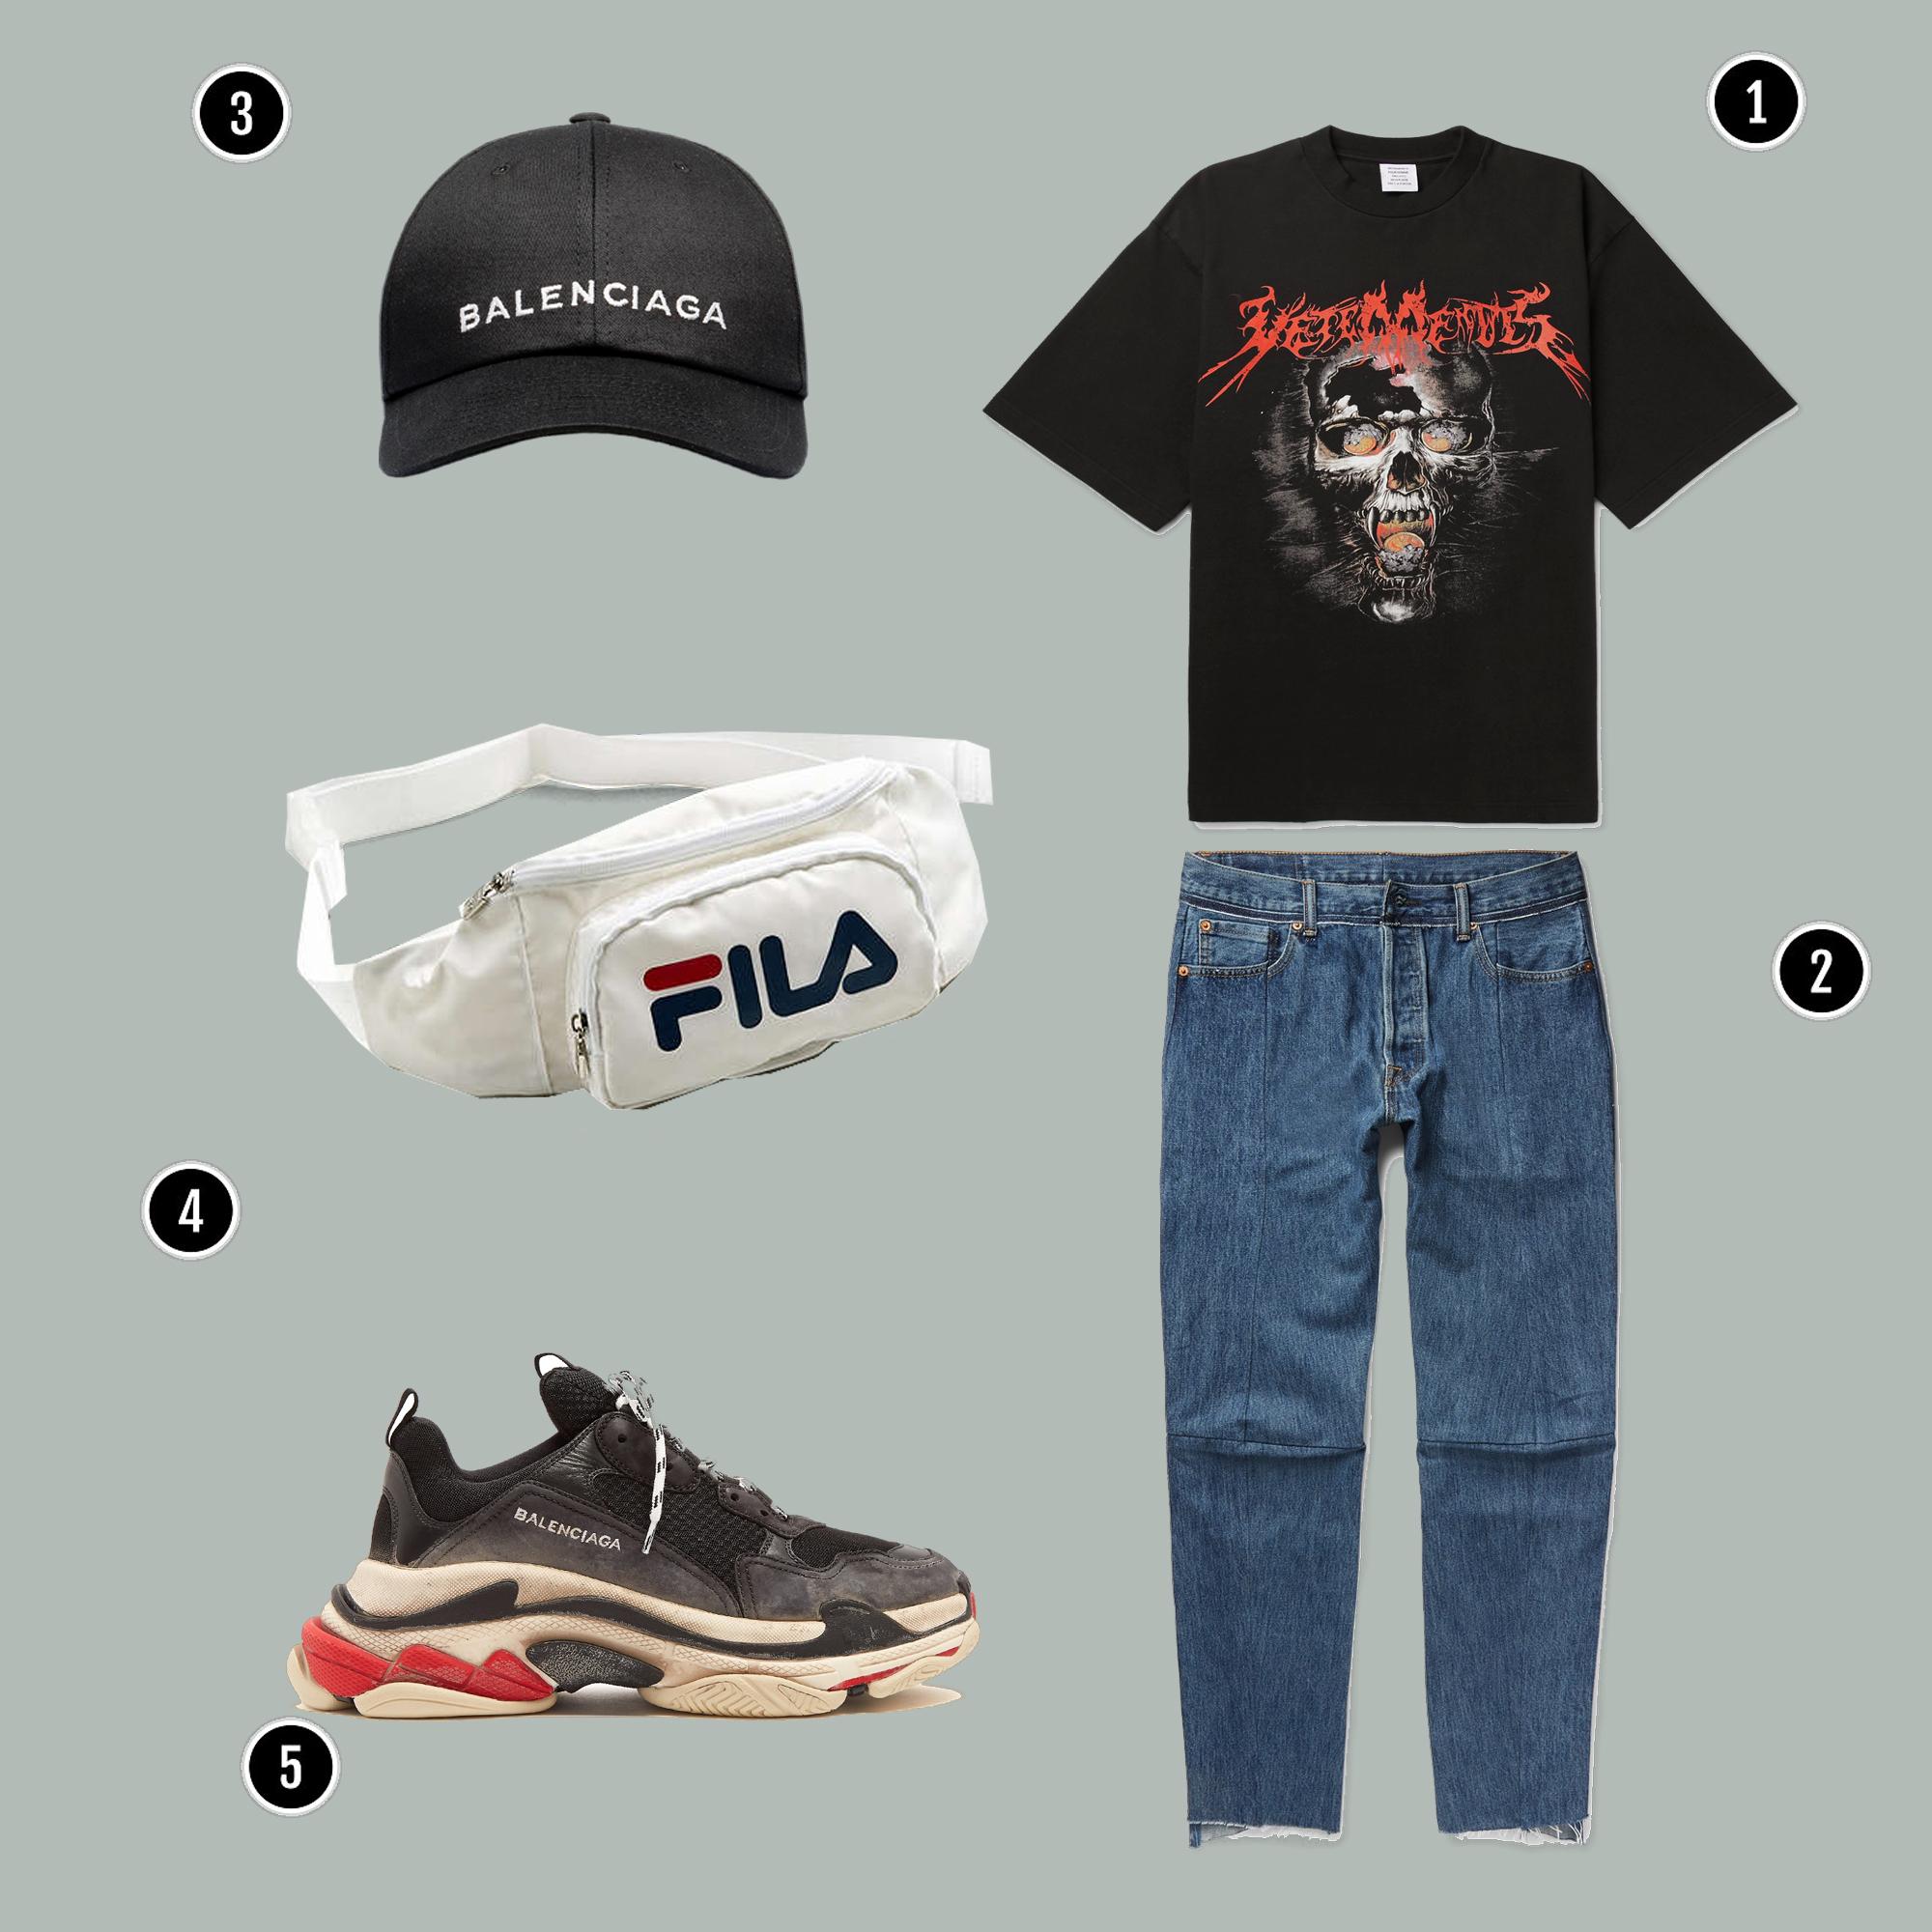 1. Áo: Vetements/ 2. Quần: Vetements / 3. Mũ: Balenciaga / 4. Túi : Fila/ 5. Giày: Balenciaga